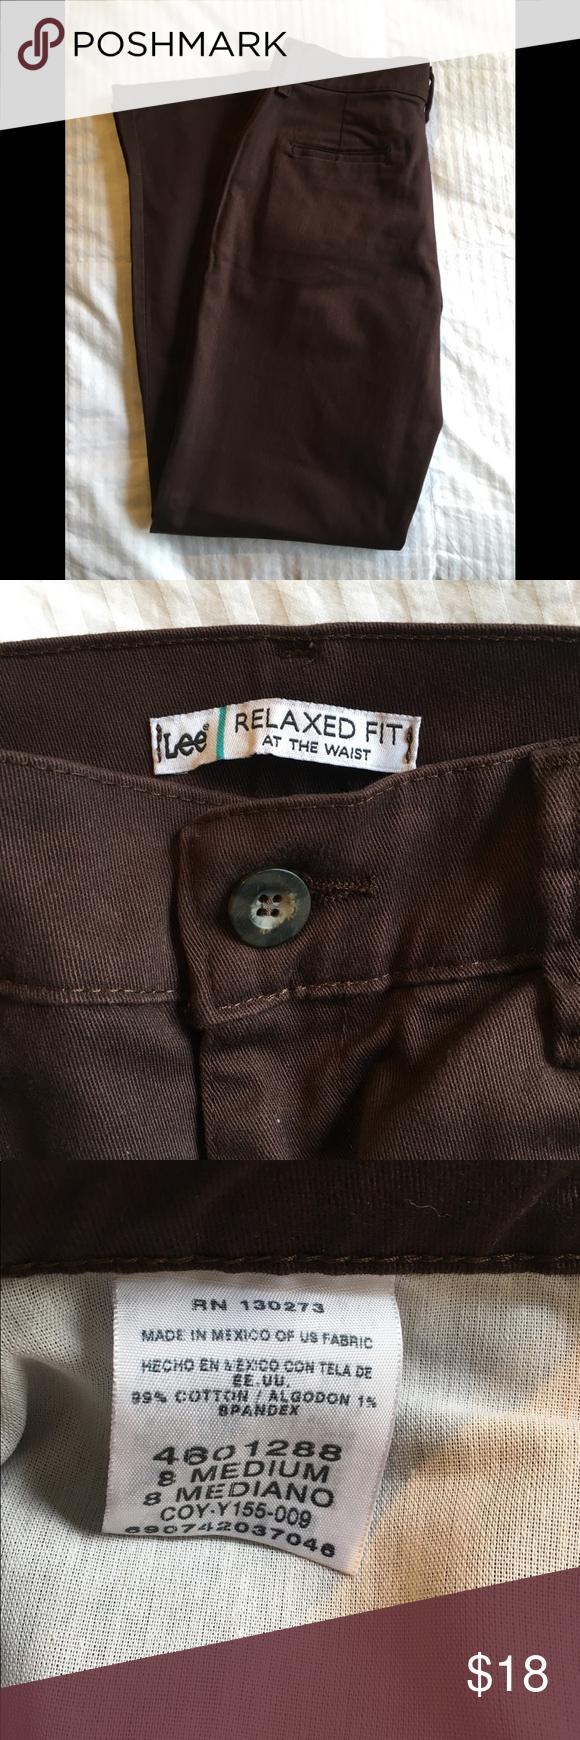 LEE Brand Brown Pants 8 MediumEUC Worn several times for